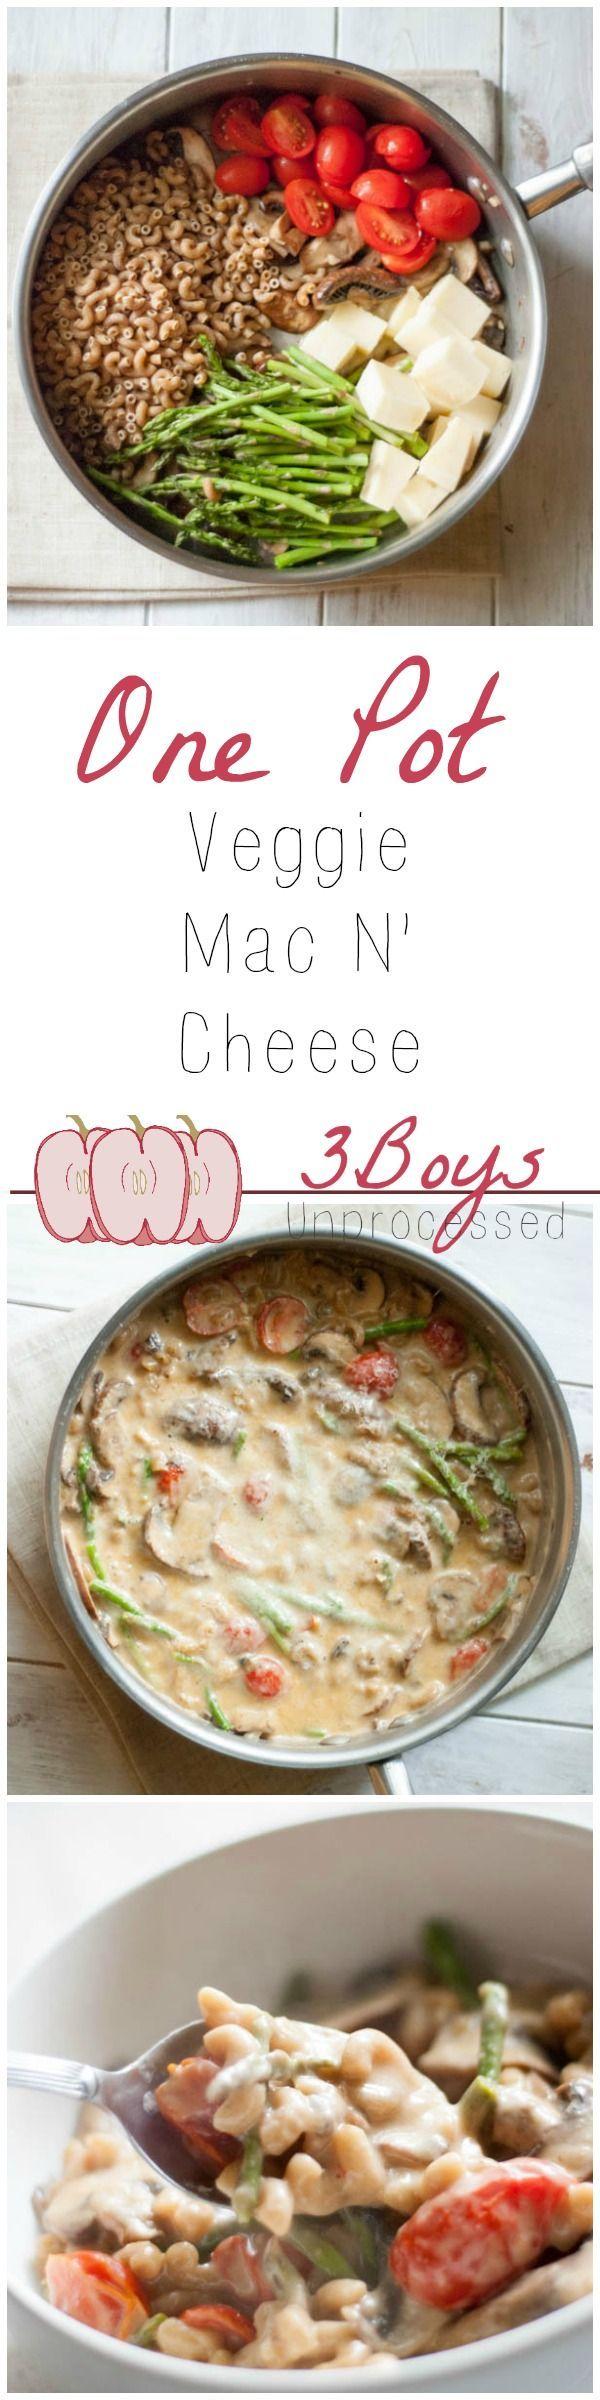 Easy n fast vegetarian recipes